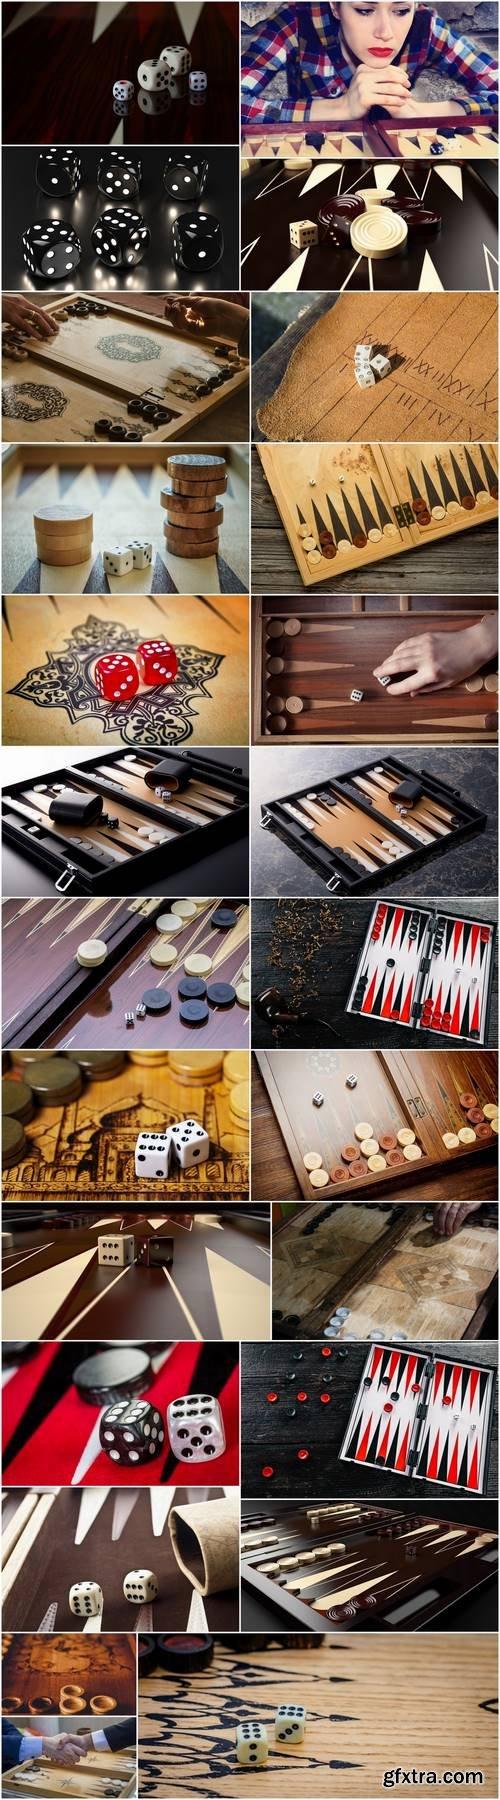 Backgammon dice board 25 HQ Jpeg